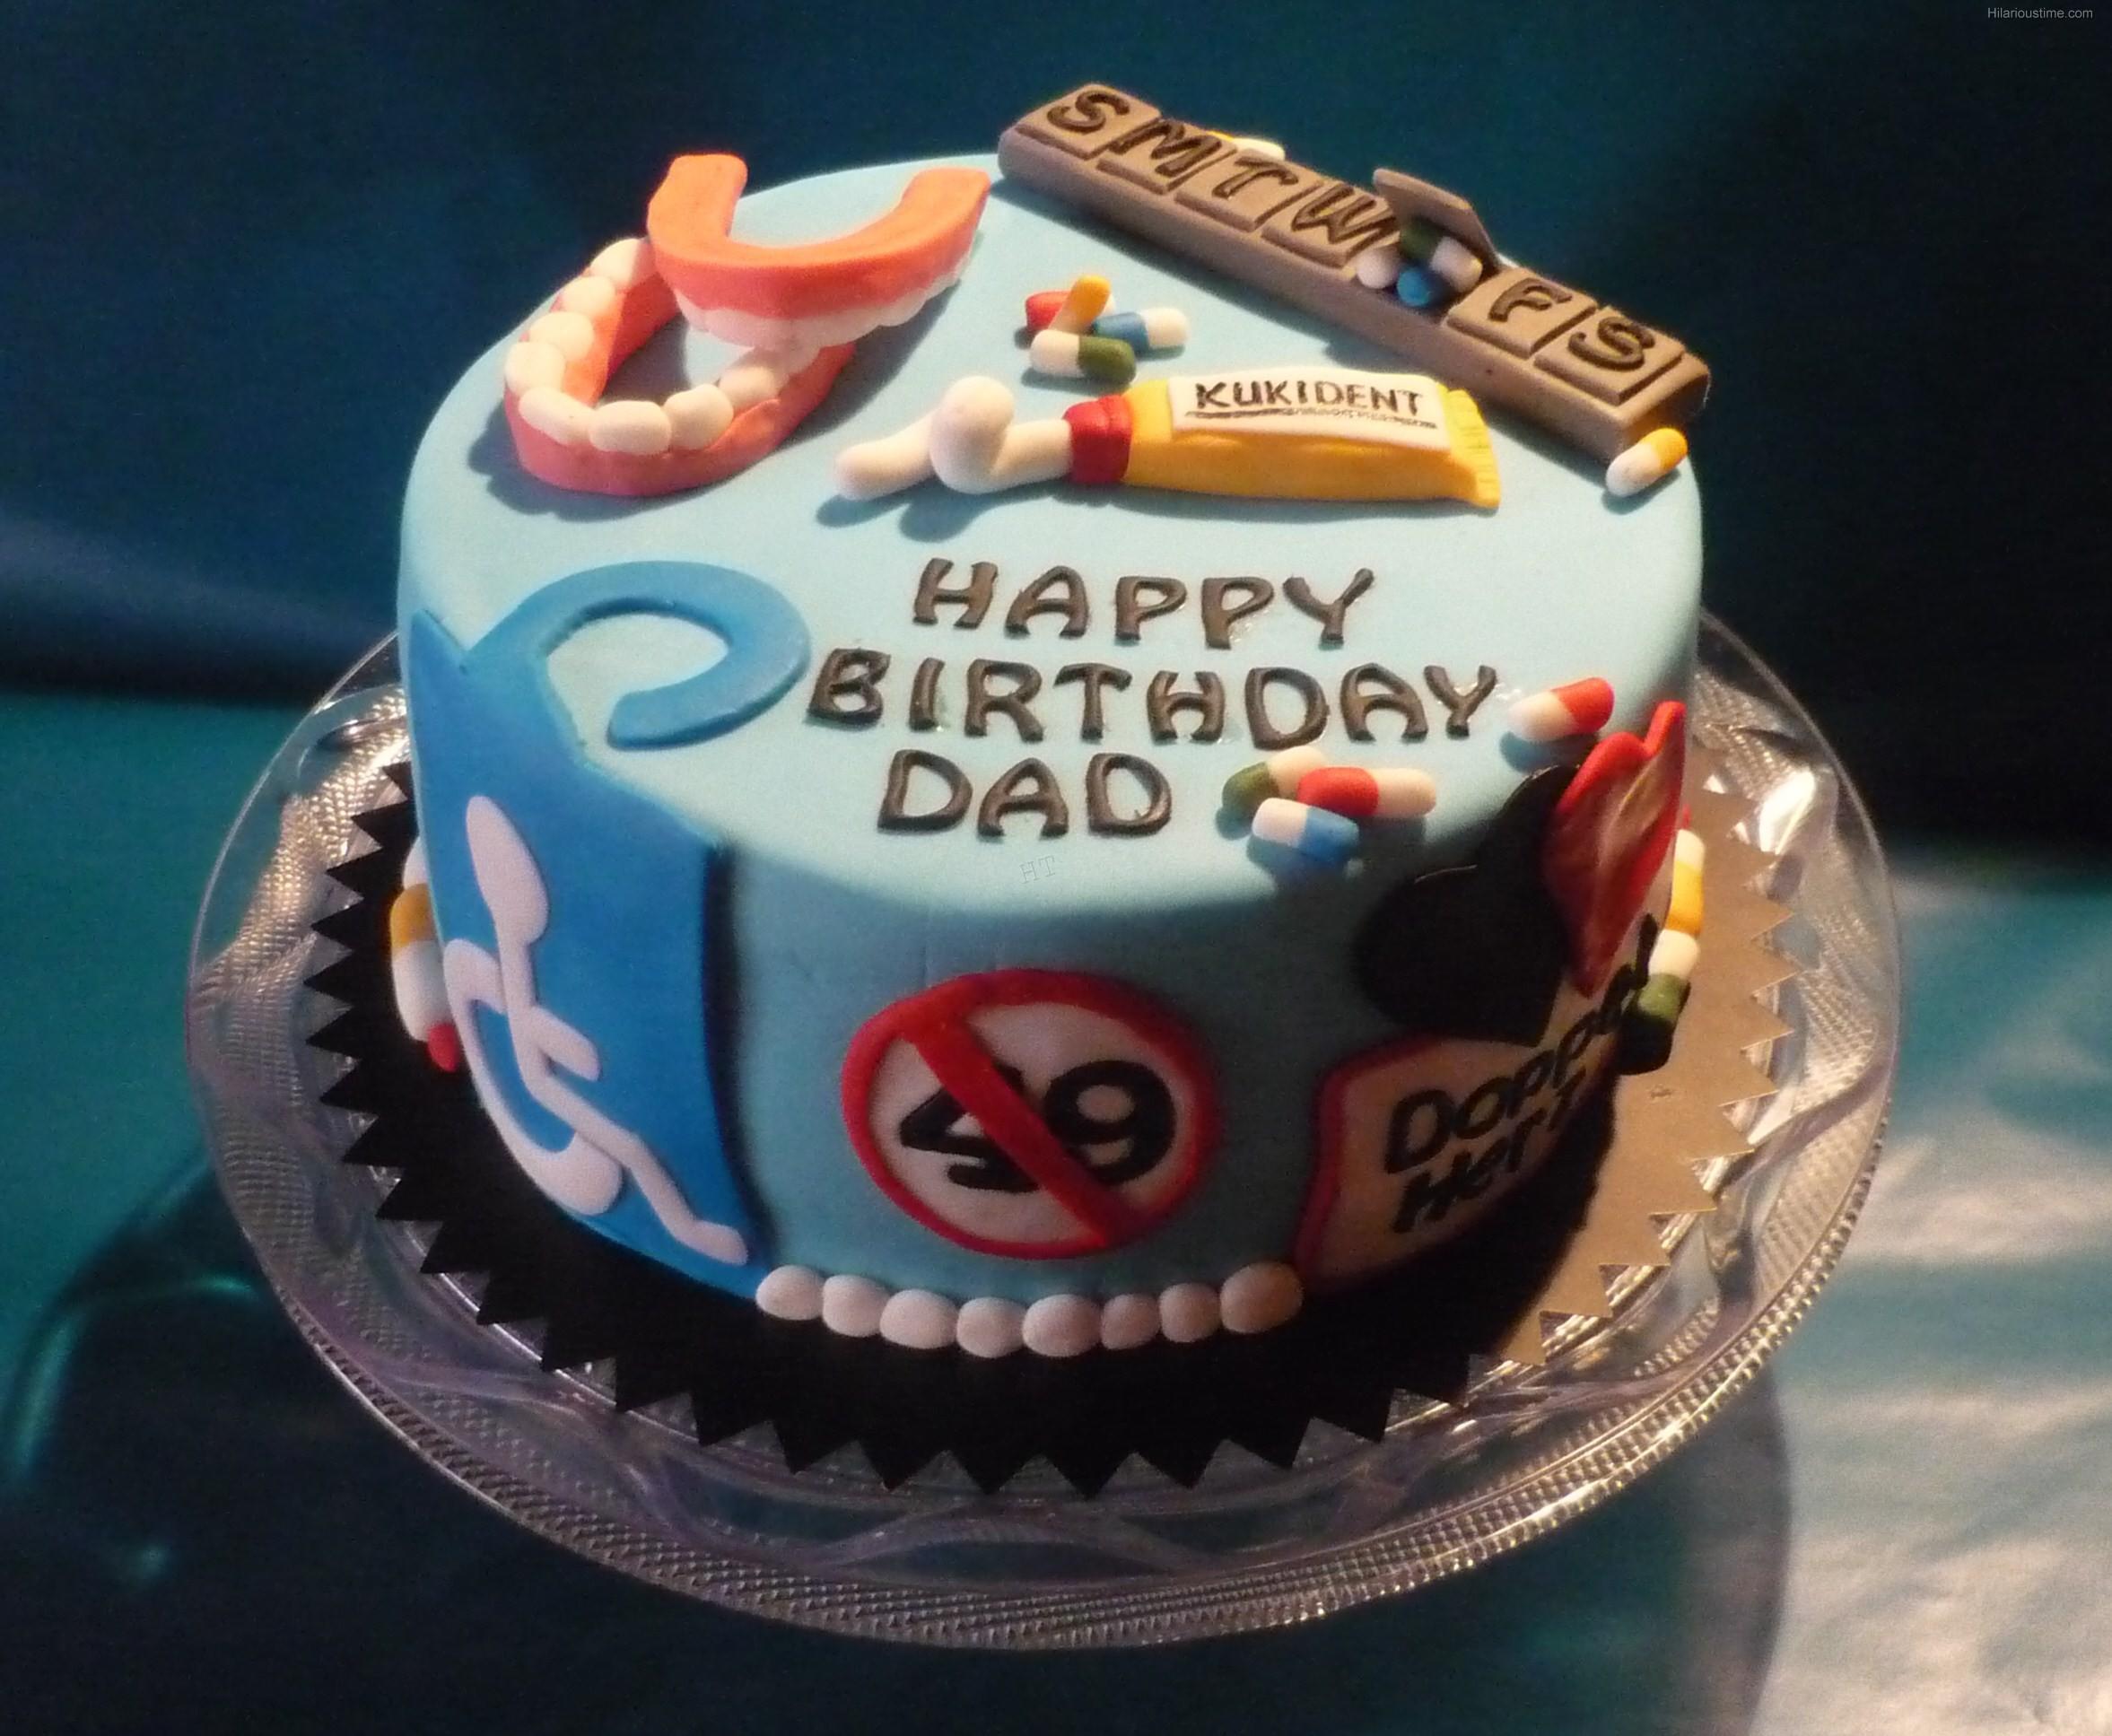 Happy birthday cucky eat your birthday cake